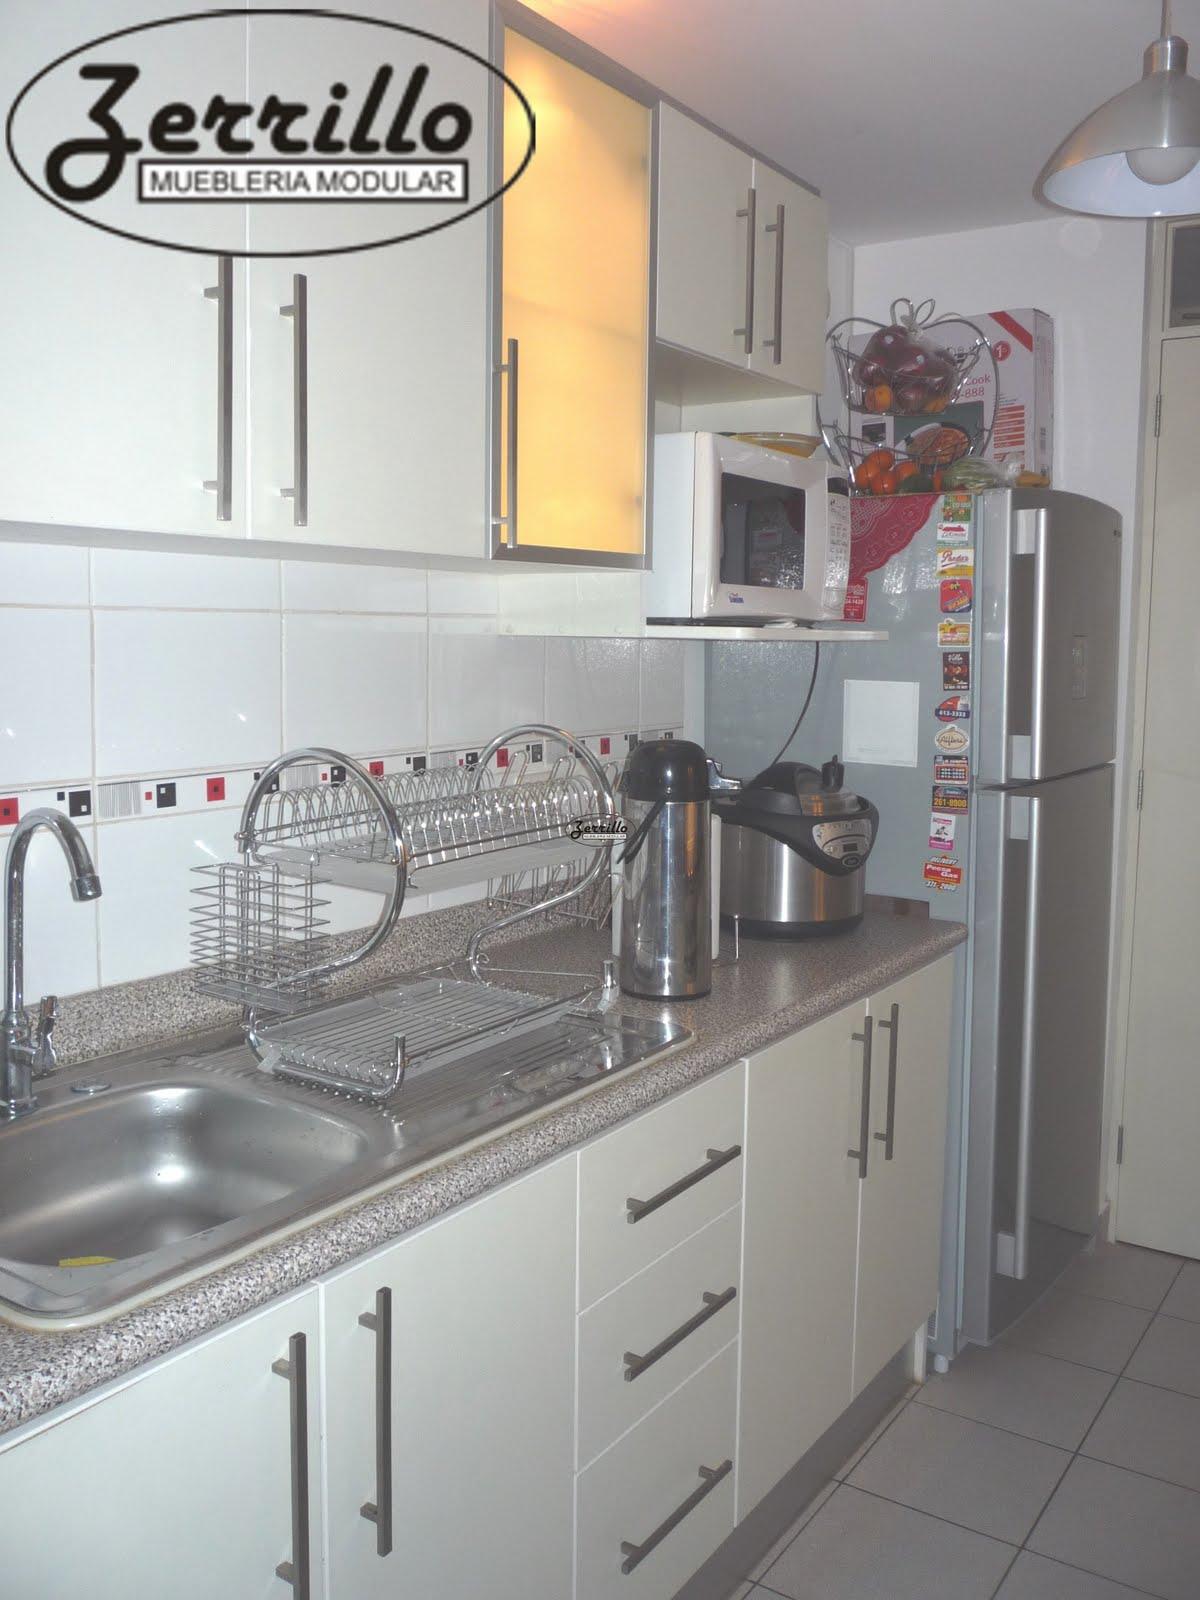 Muebles de melamine for Guardas para cocina